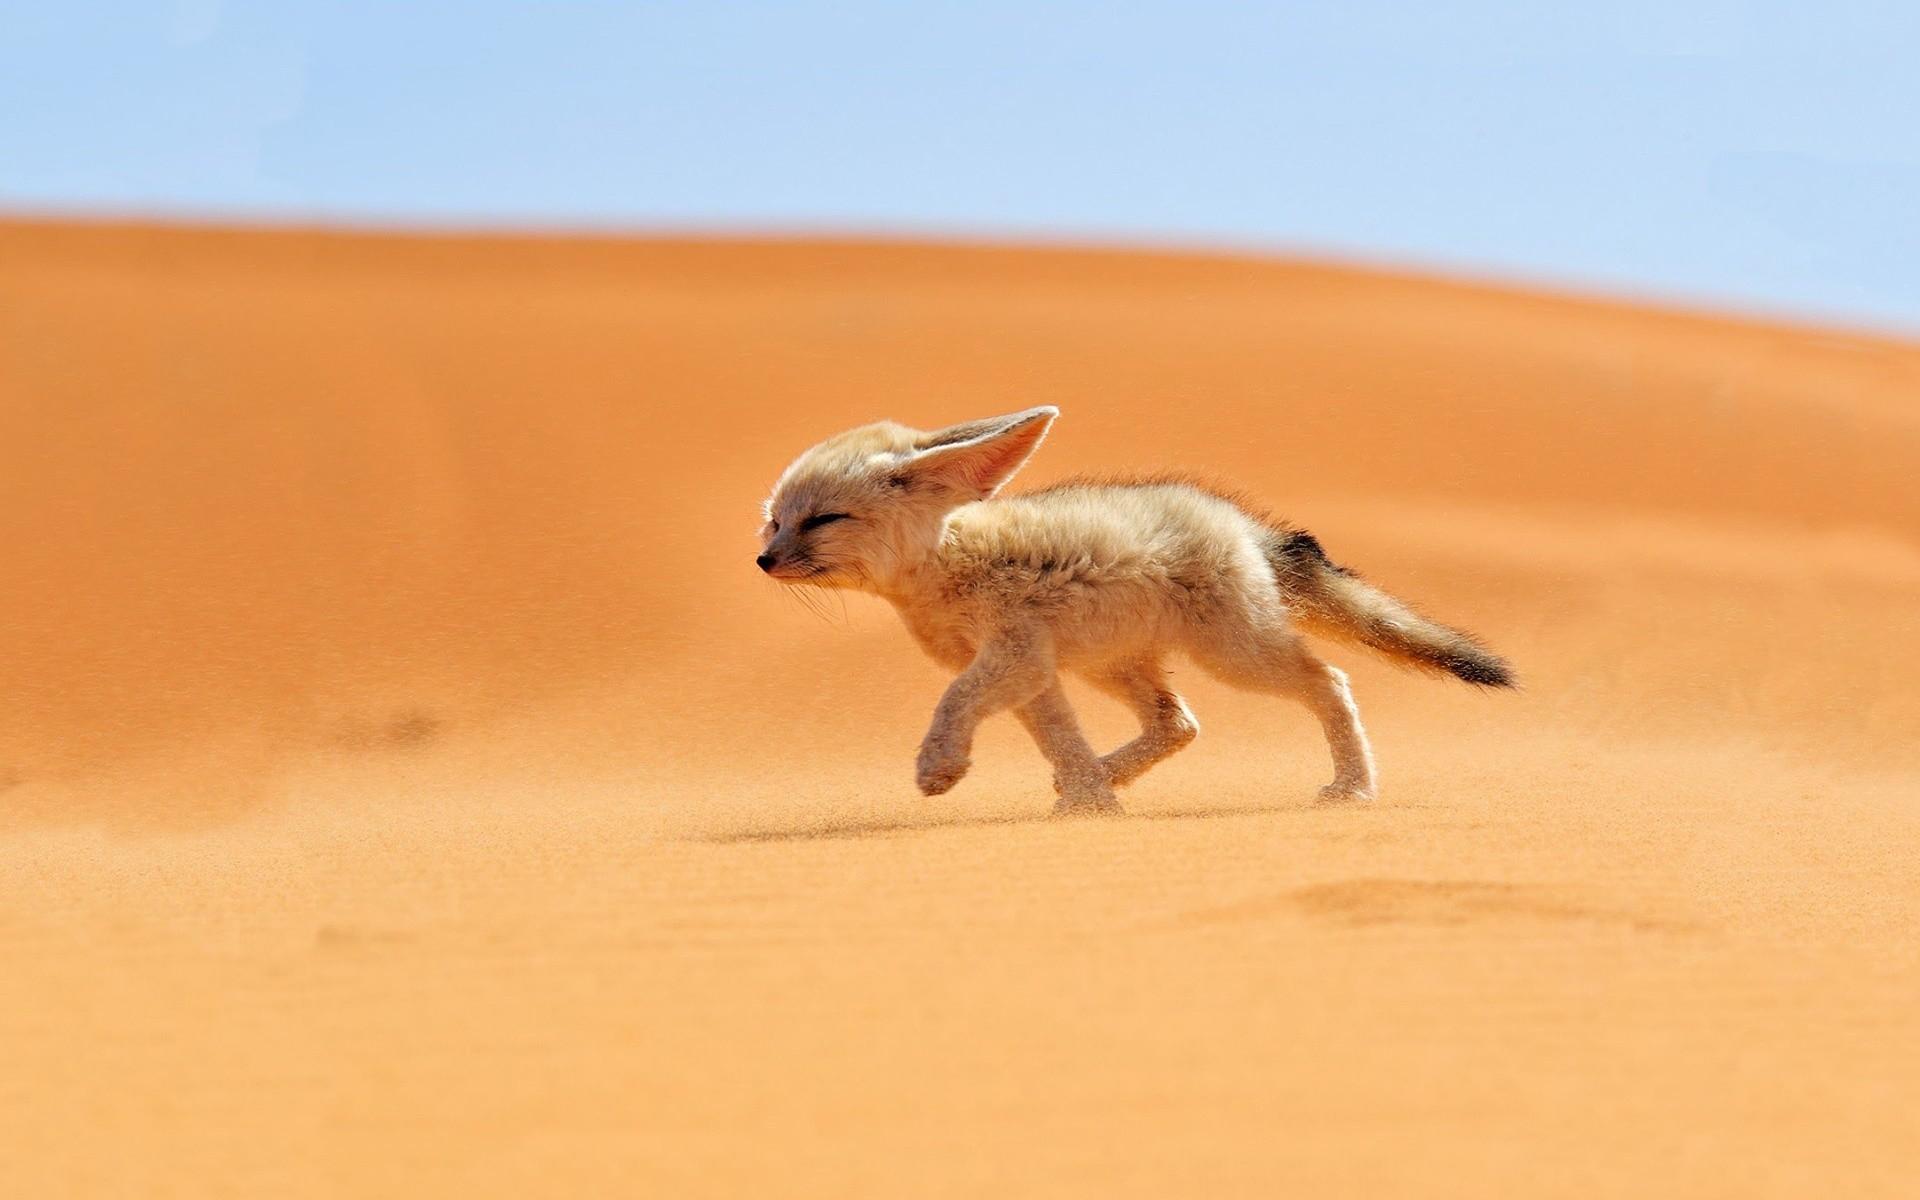 Baby Fox Desert wallpaper amazing Wallpaper high quality, Backgrounds for  mobile, iphone, desktop